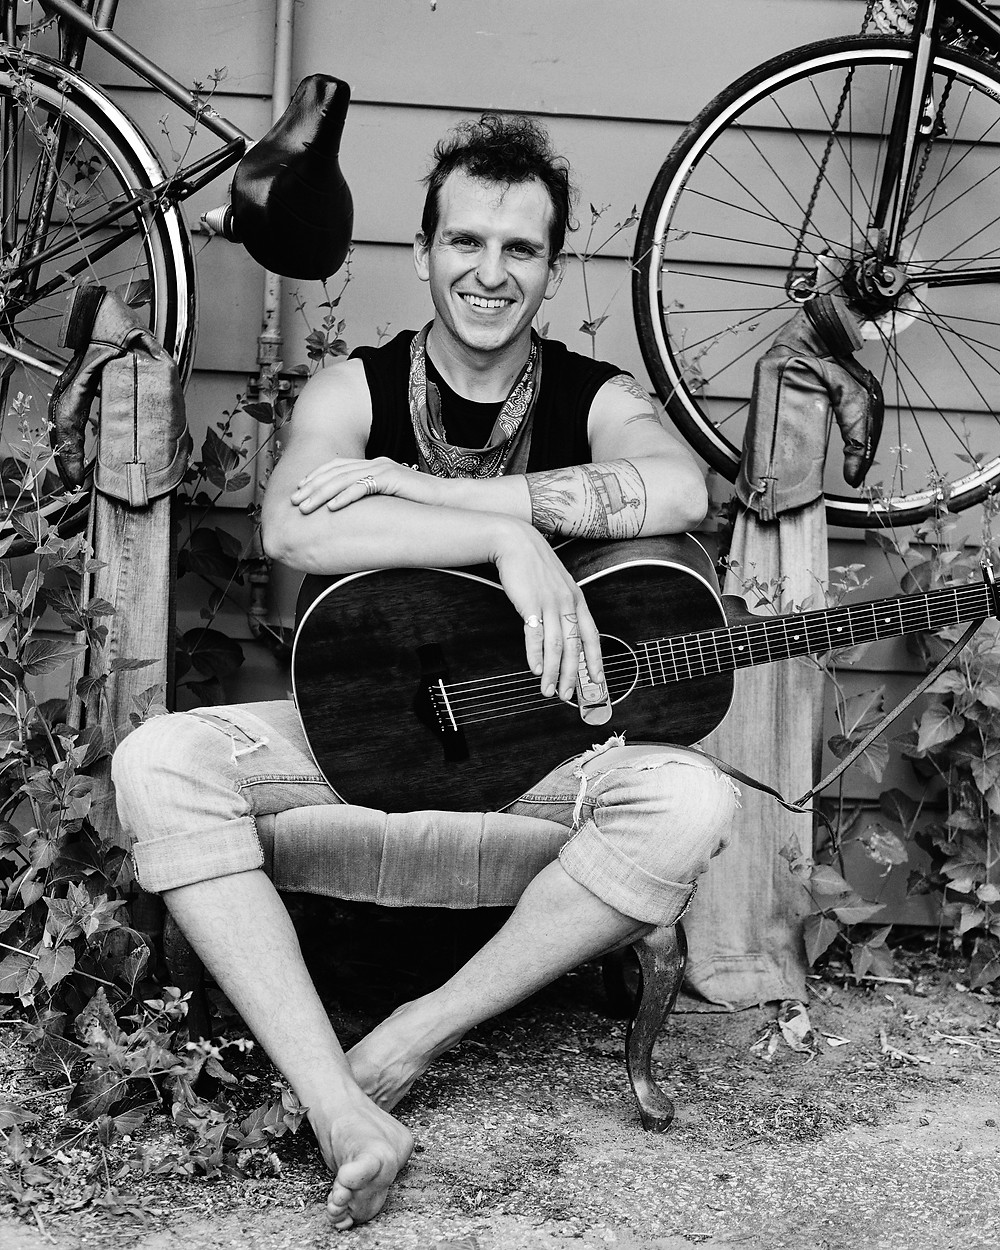 Burlington Musician and Guitarist Eric George at his home